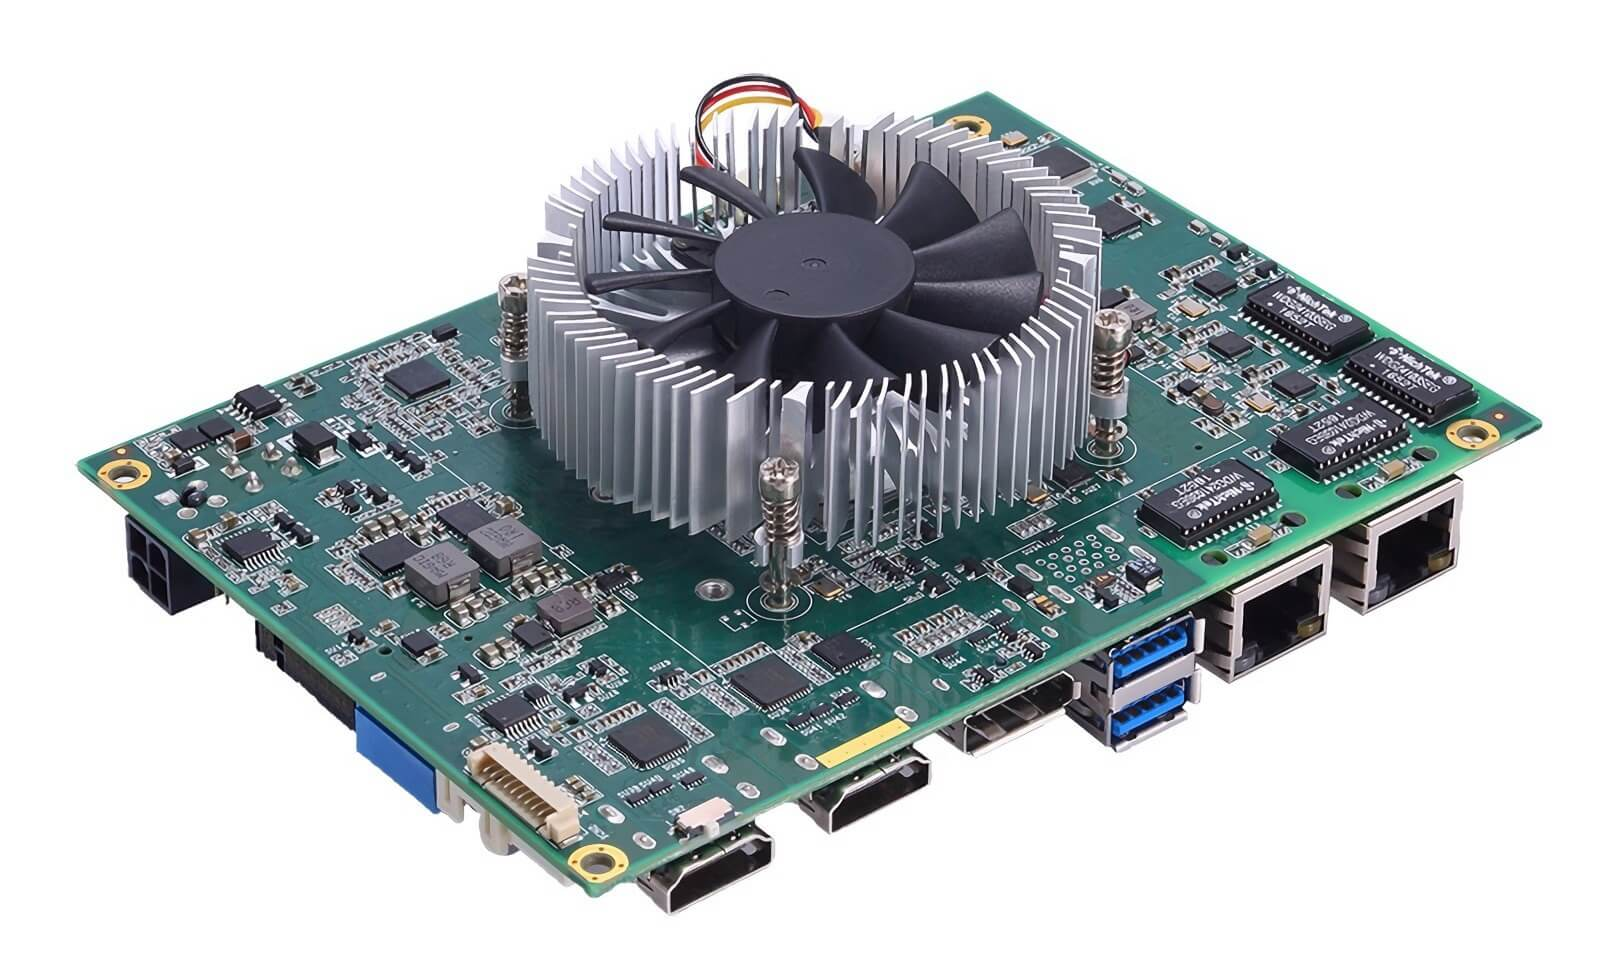 20200526.This-Raspberry-Pi-like-SBC-packs-a-Ryzen-APU-with-Vega-11-01.jpg